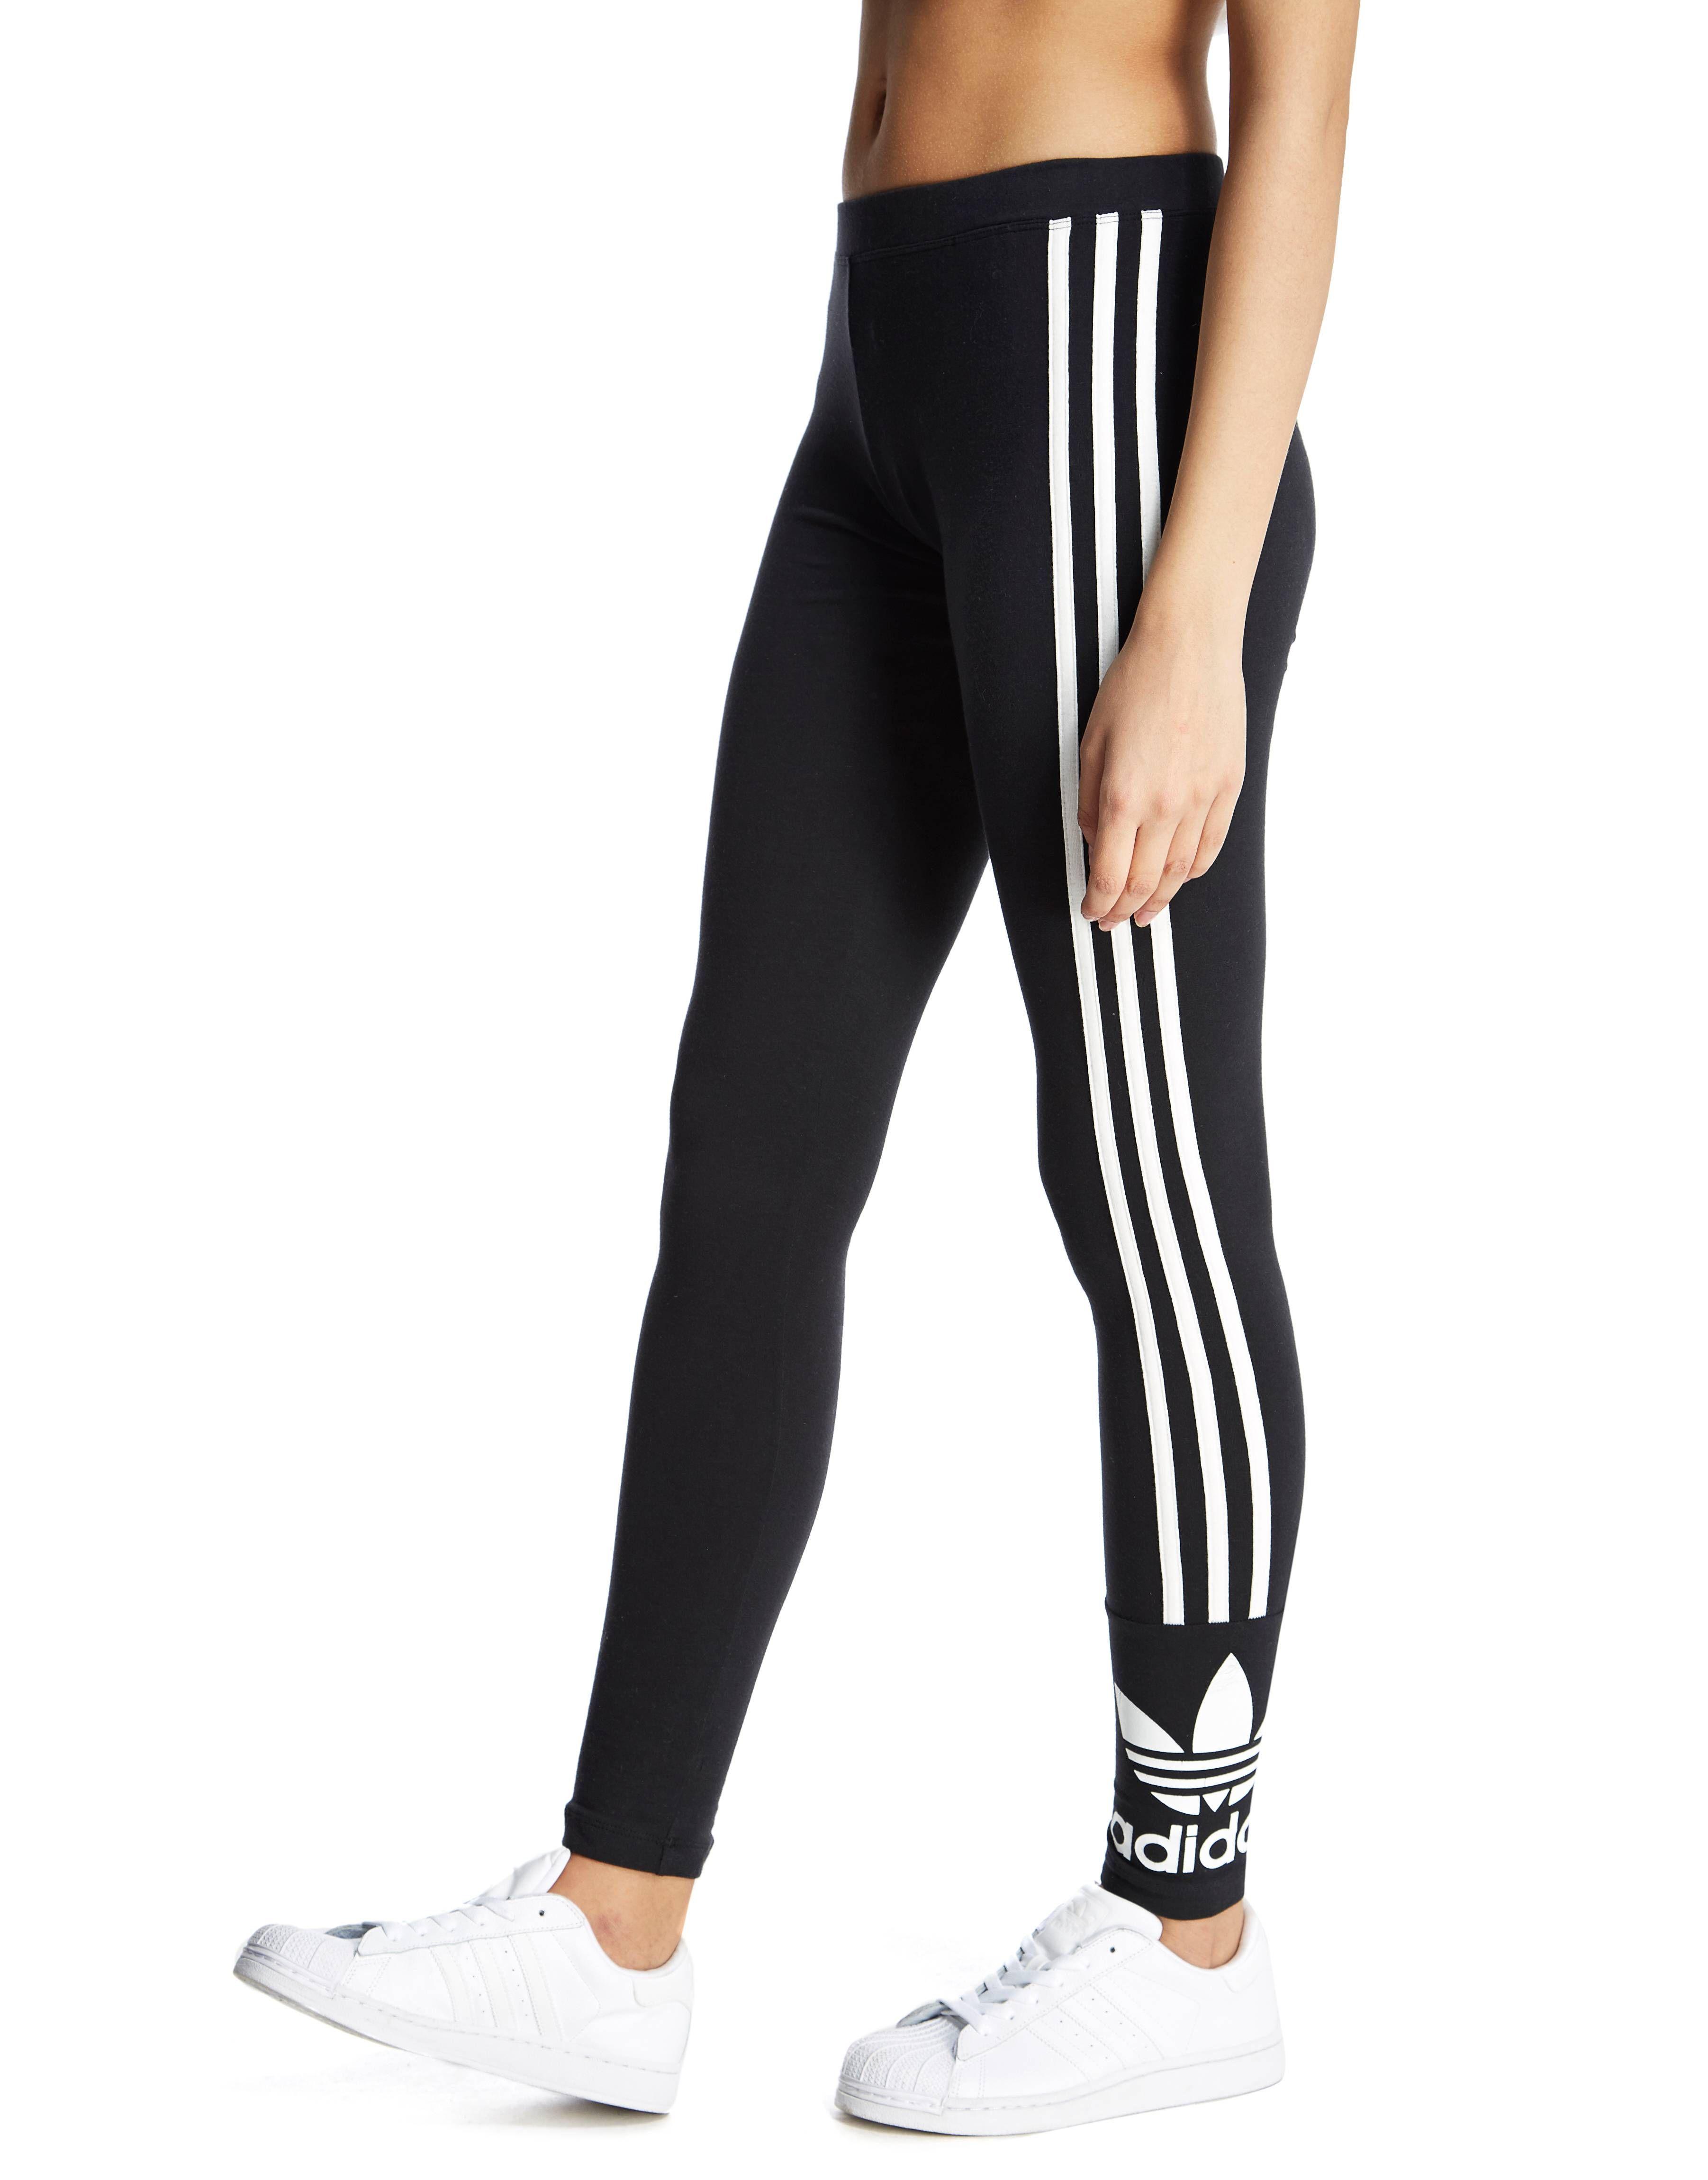 Adidas Originals 3 Stripe Trefoil Leggings Jd Sports Sverige Black Cotton Leggings Black Legging Pants Adidas Leggings